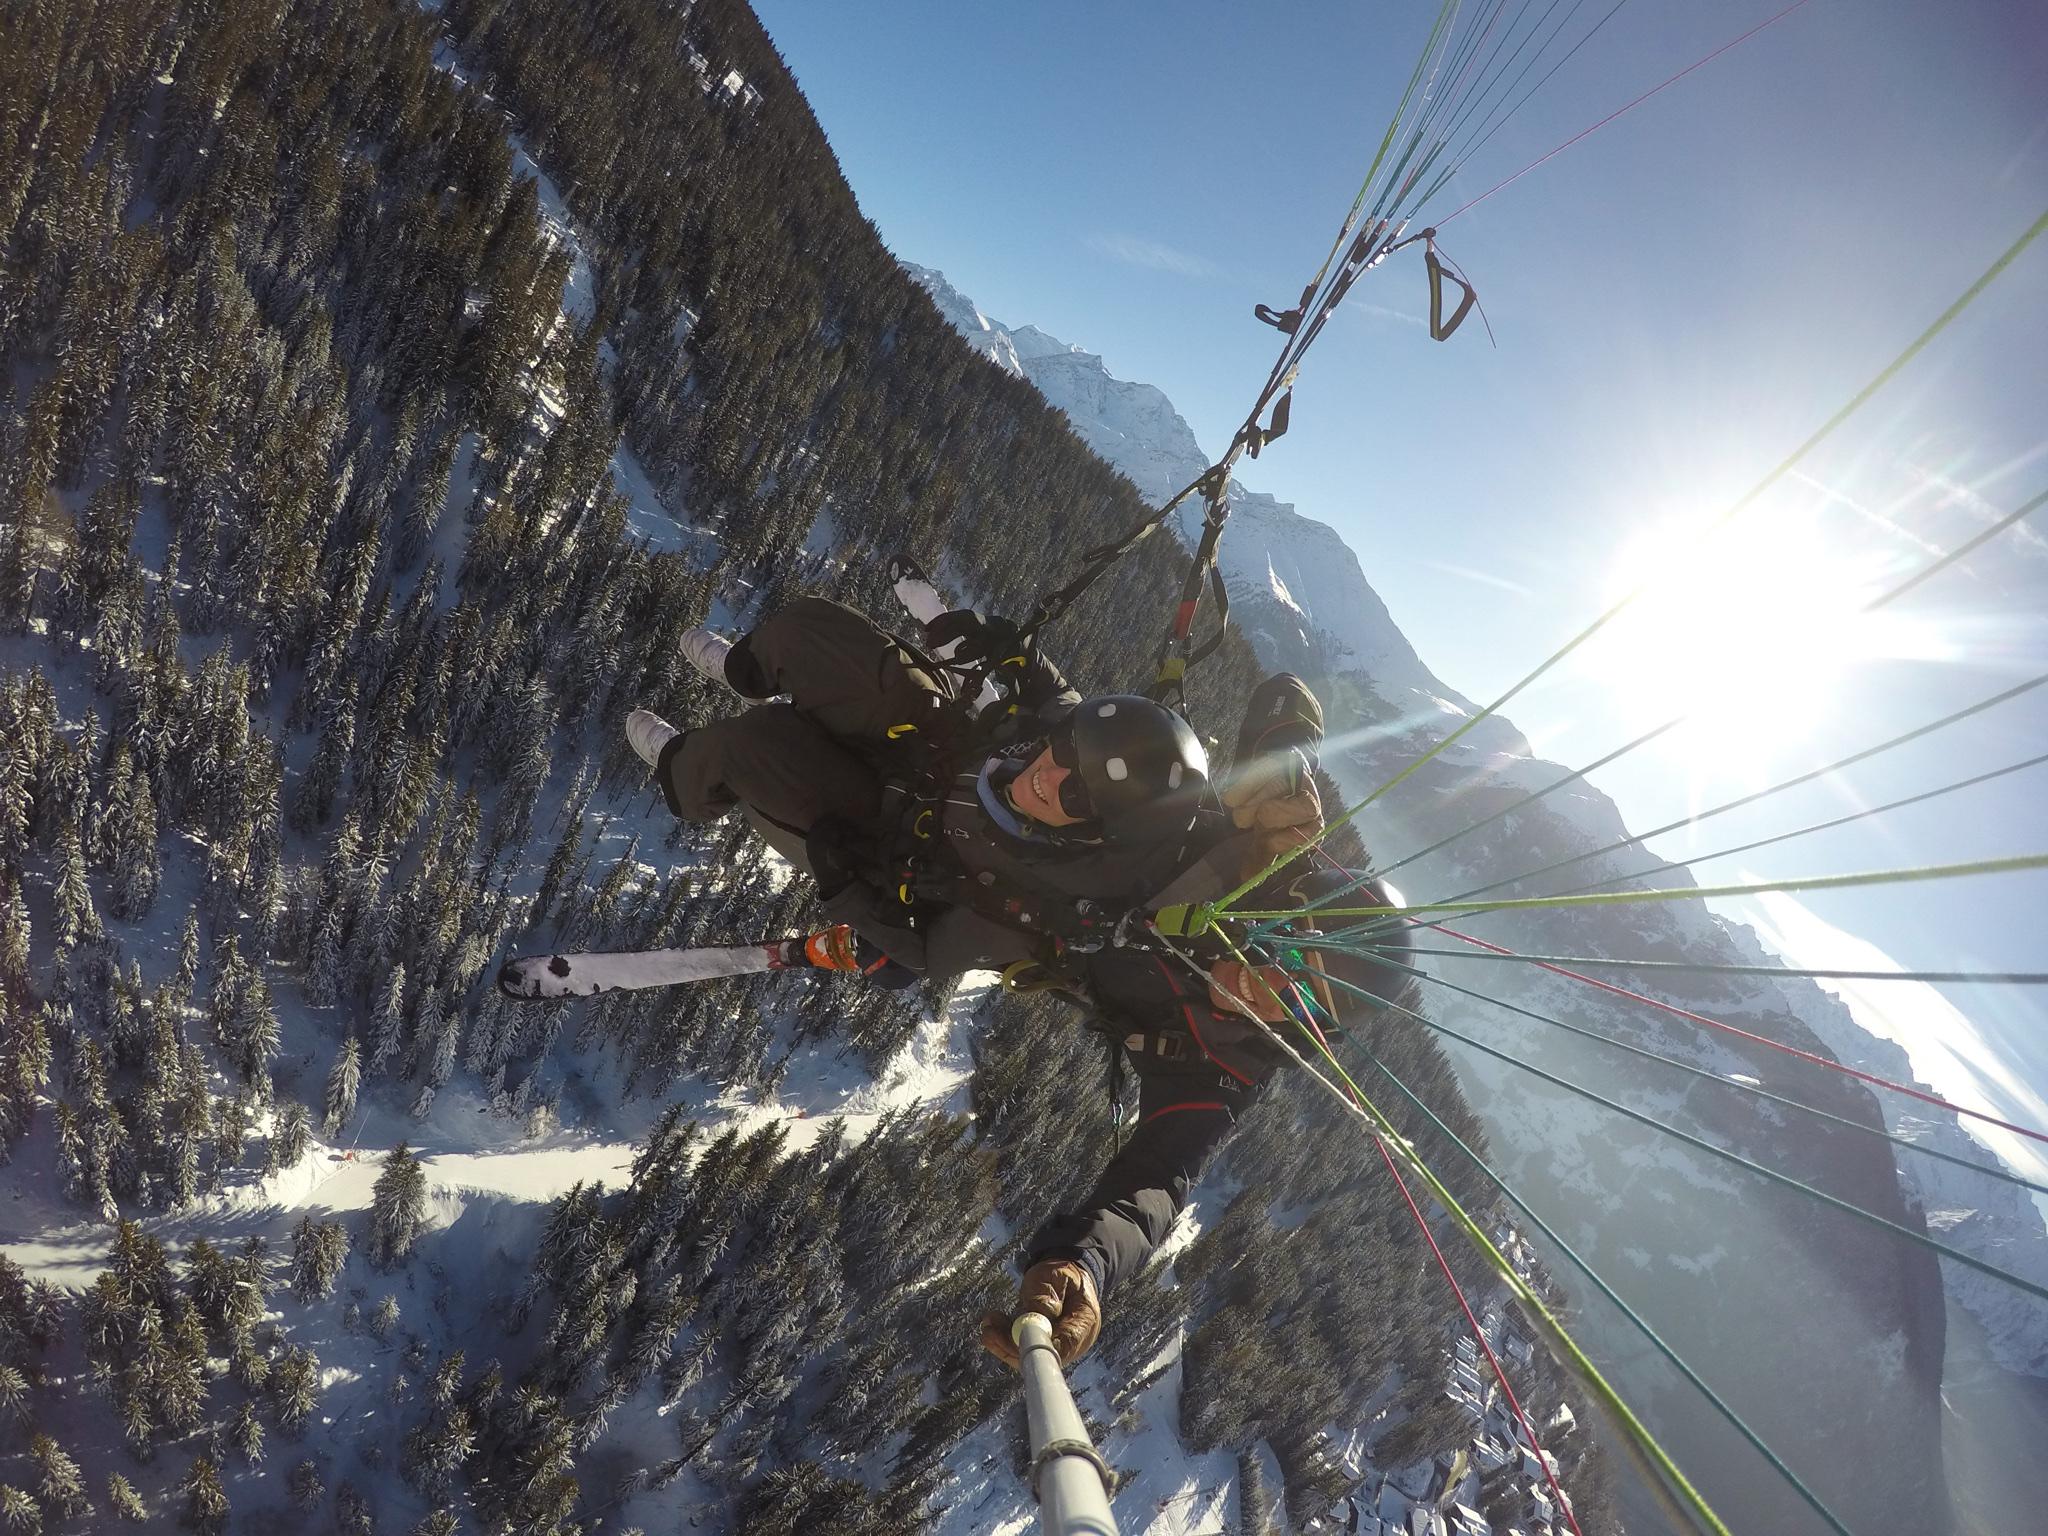 Proof that Leslie paraglided. Verbier, Switzerland, December 2018.